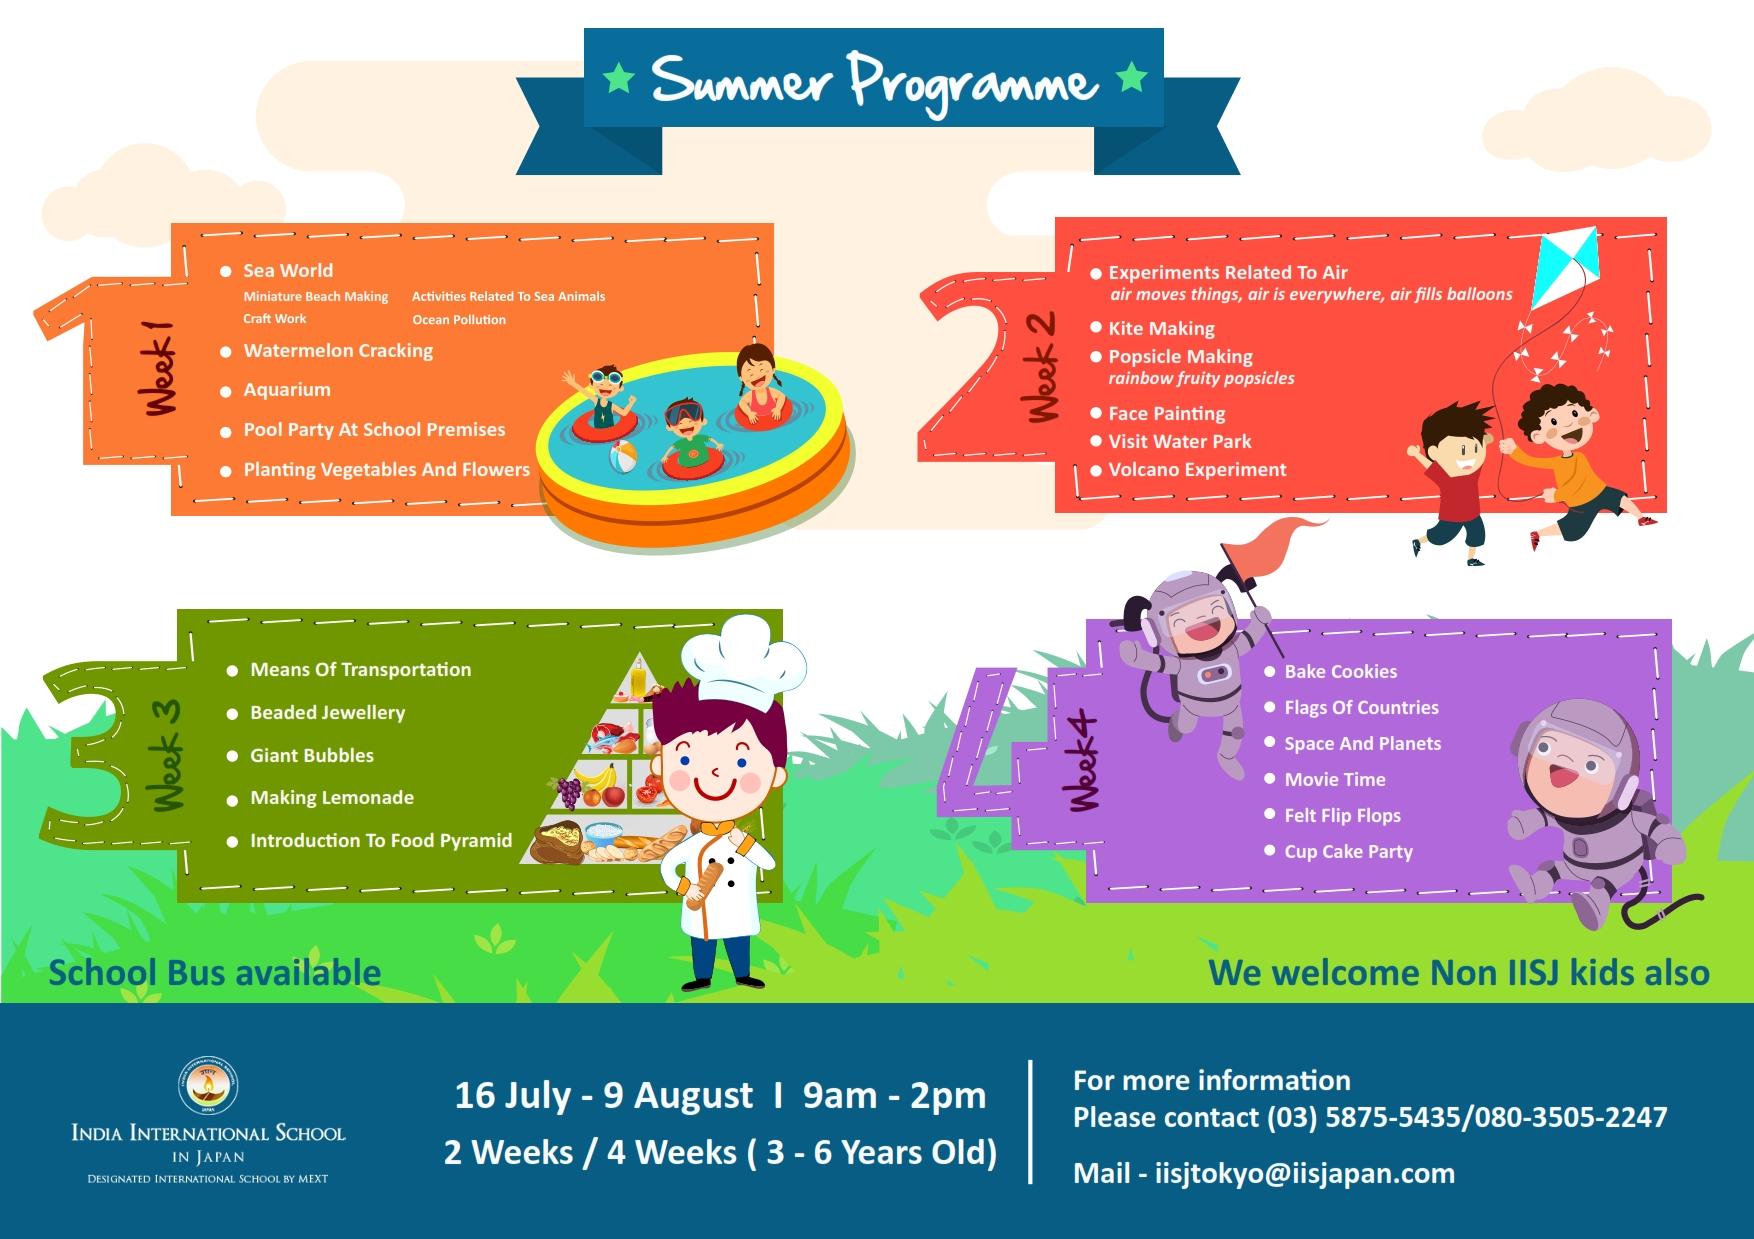 Summer School Programe Banner Image